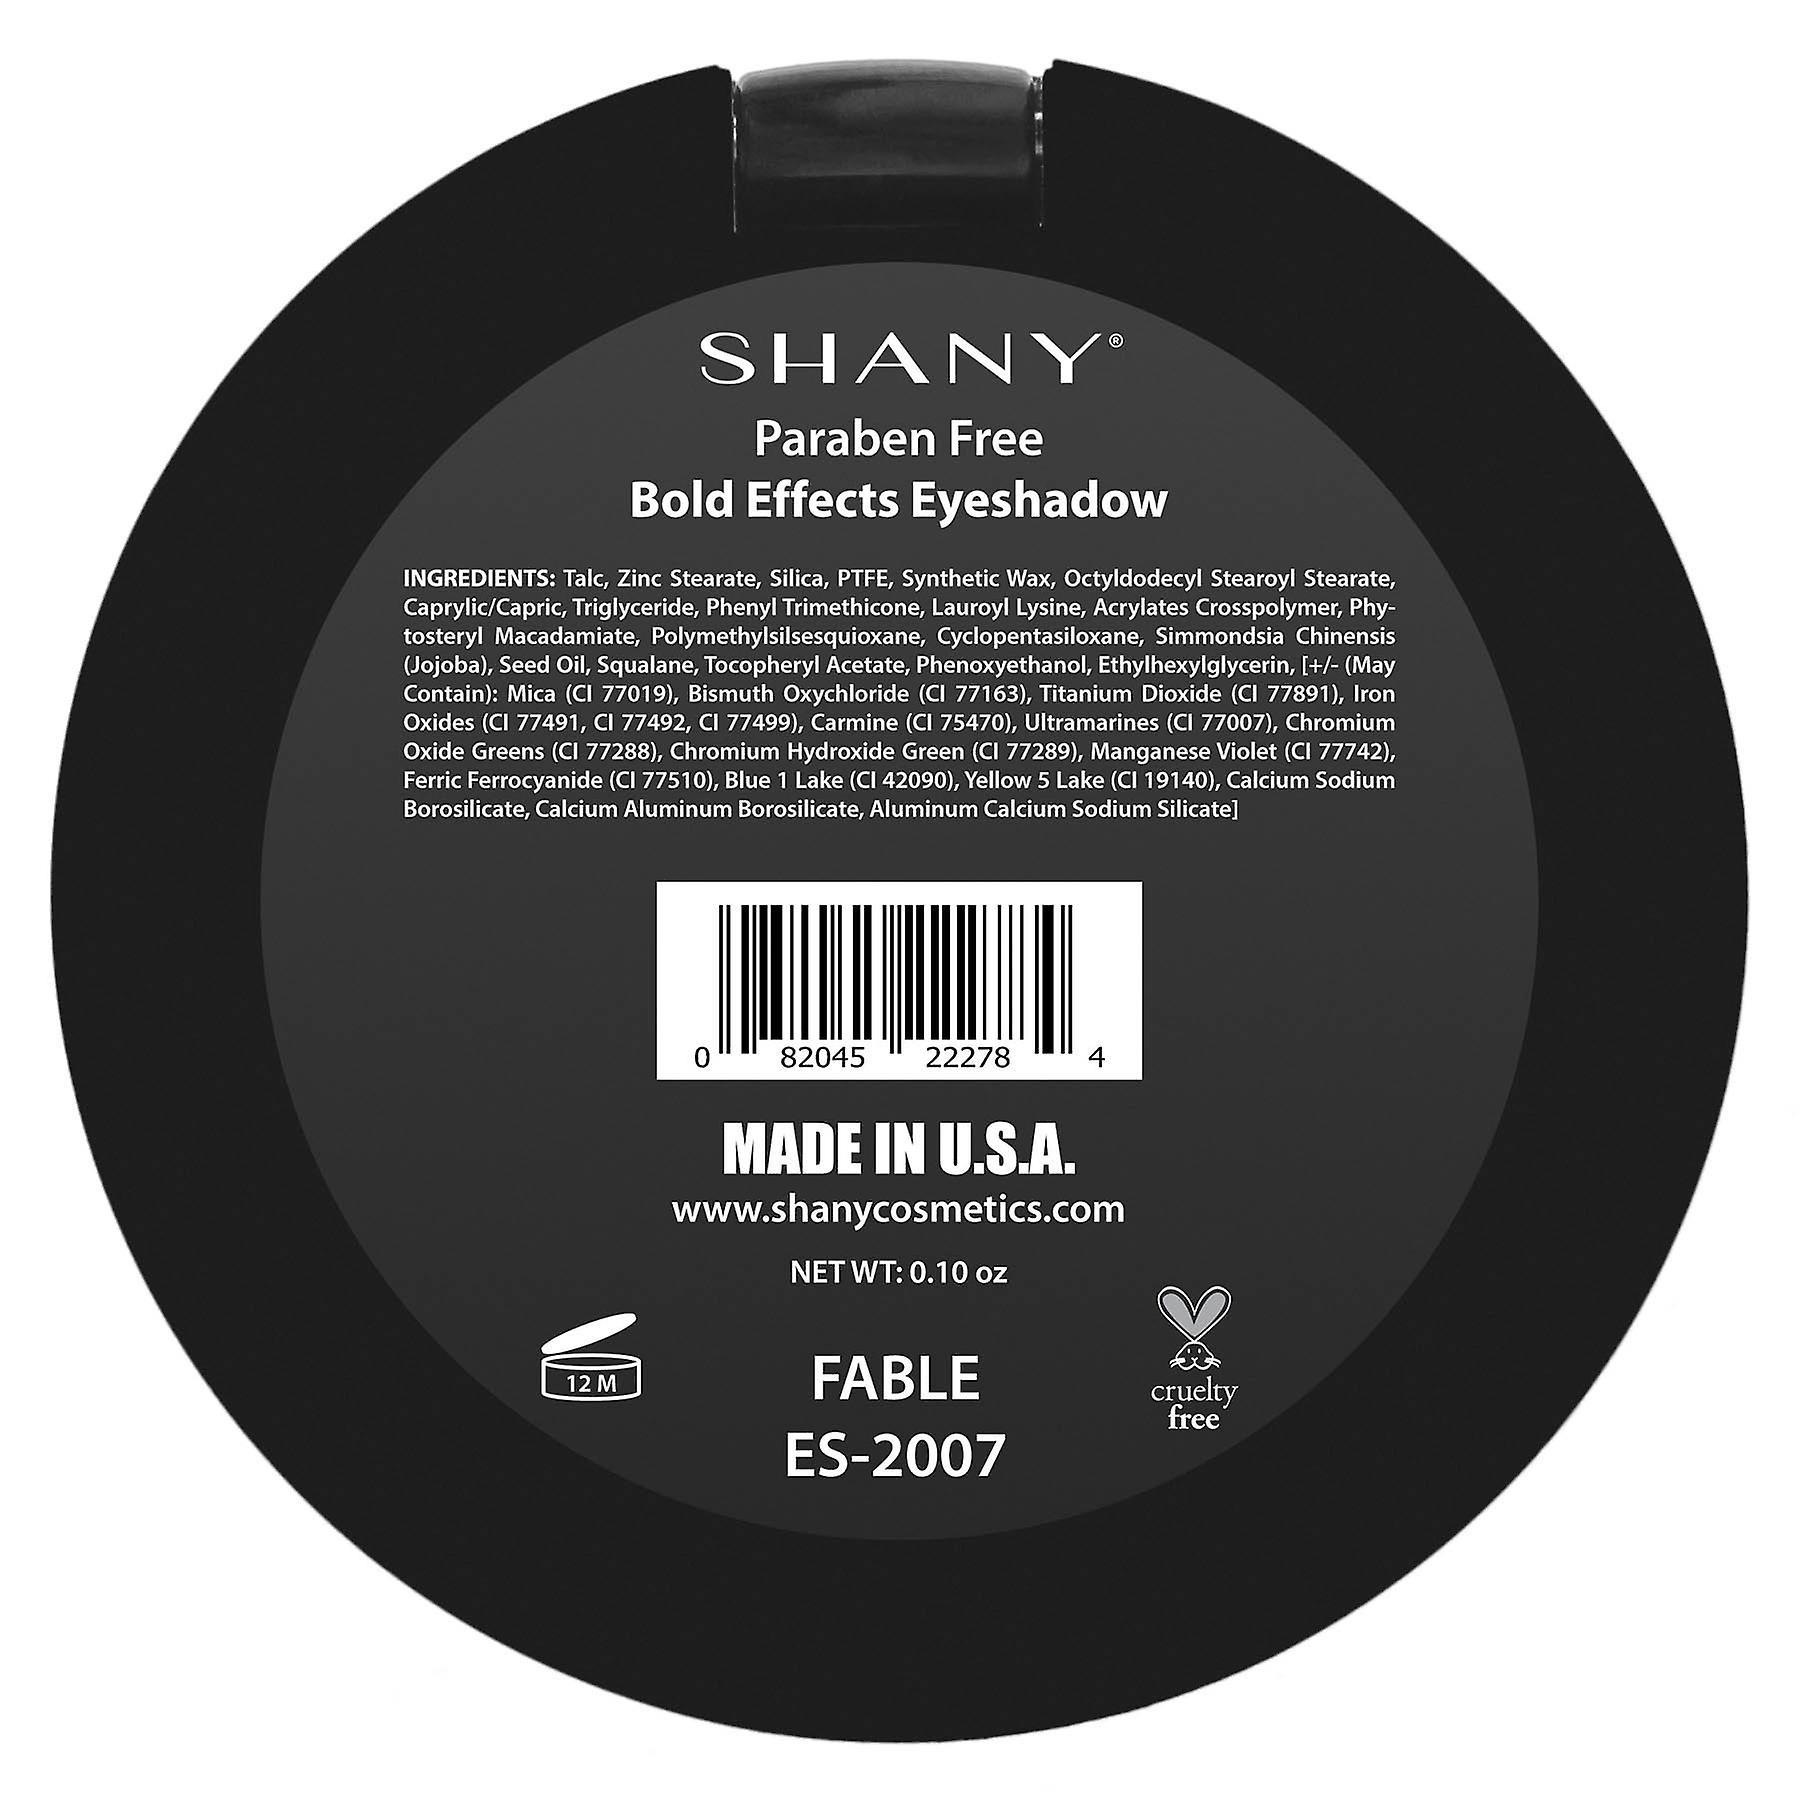 SHANY Bold Effect Eye Shadow - Paraben Free - Made in U.S.A